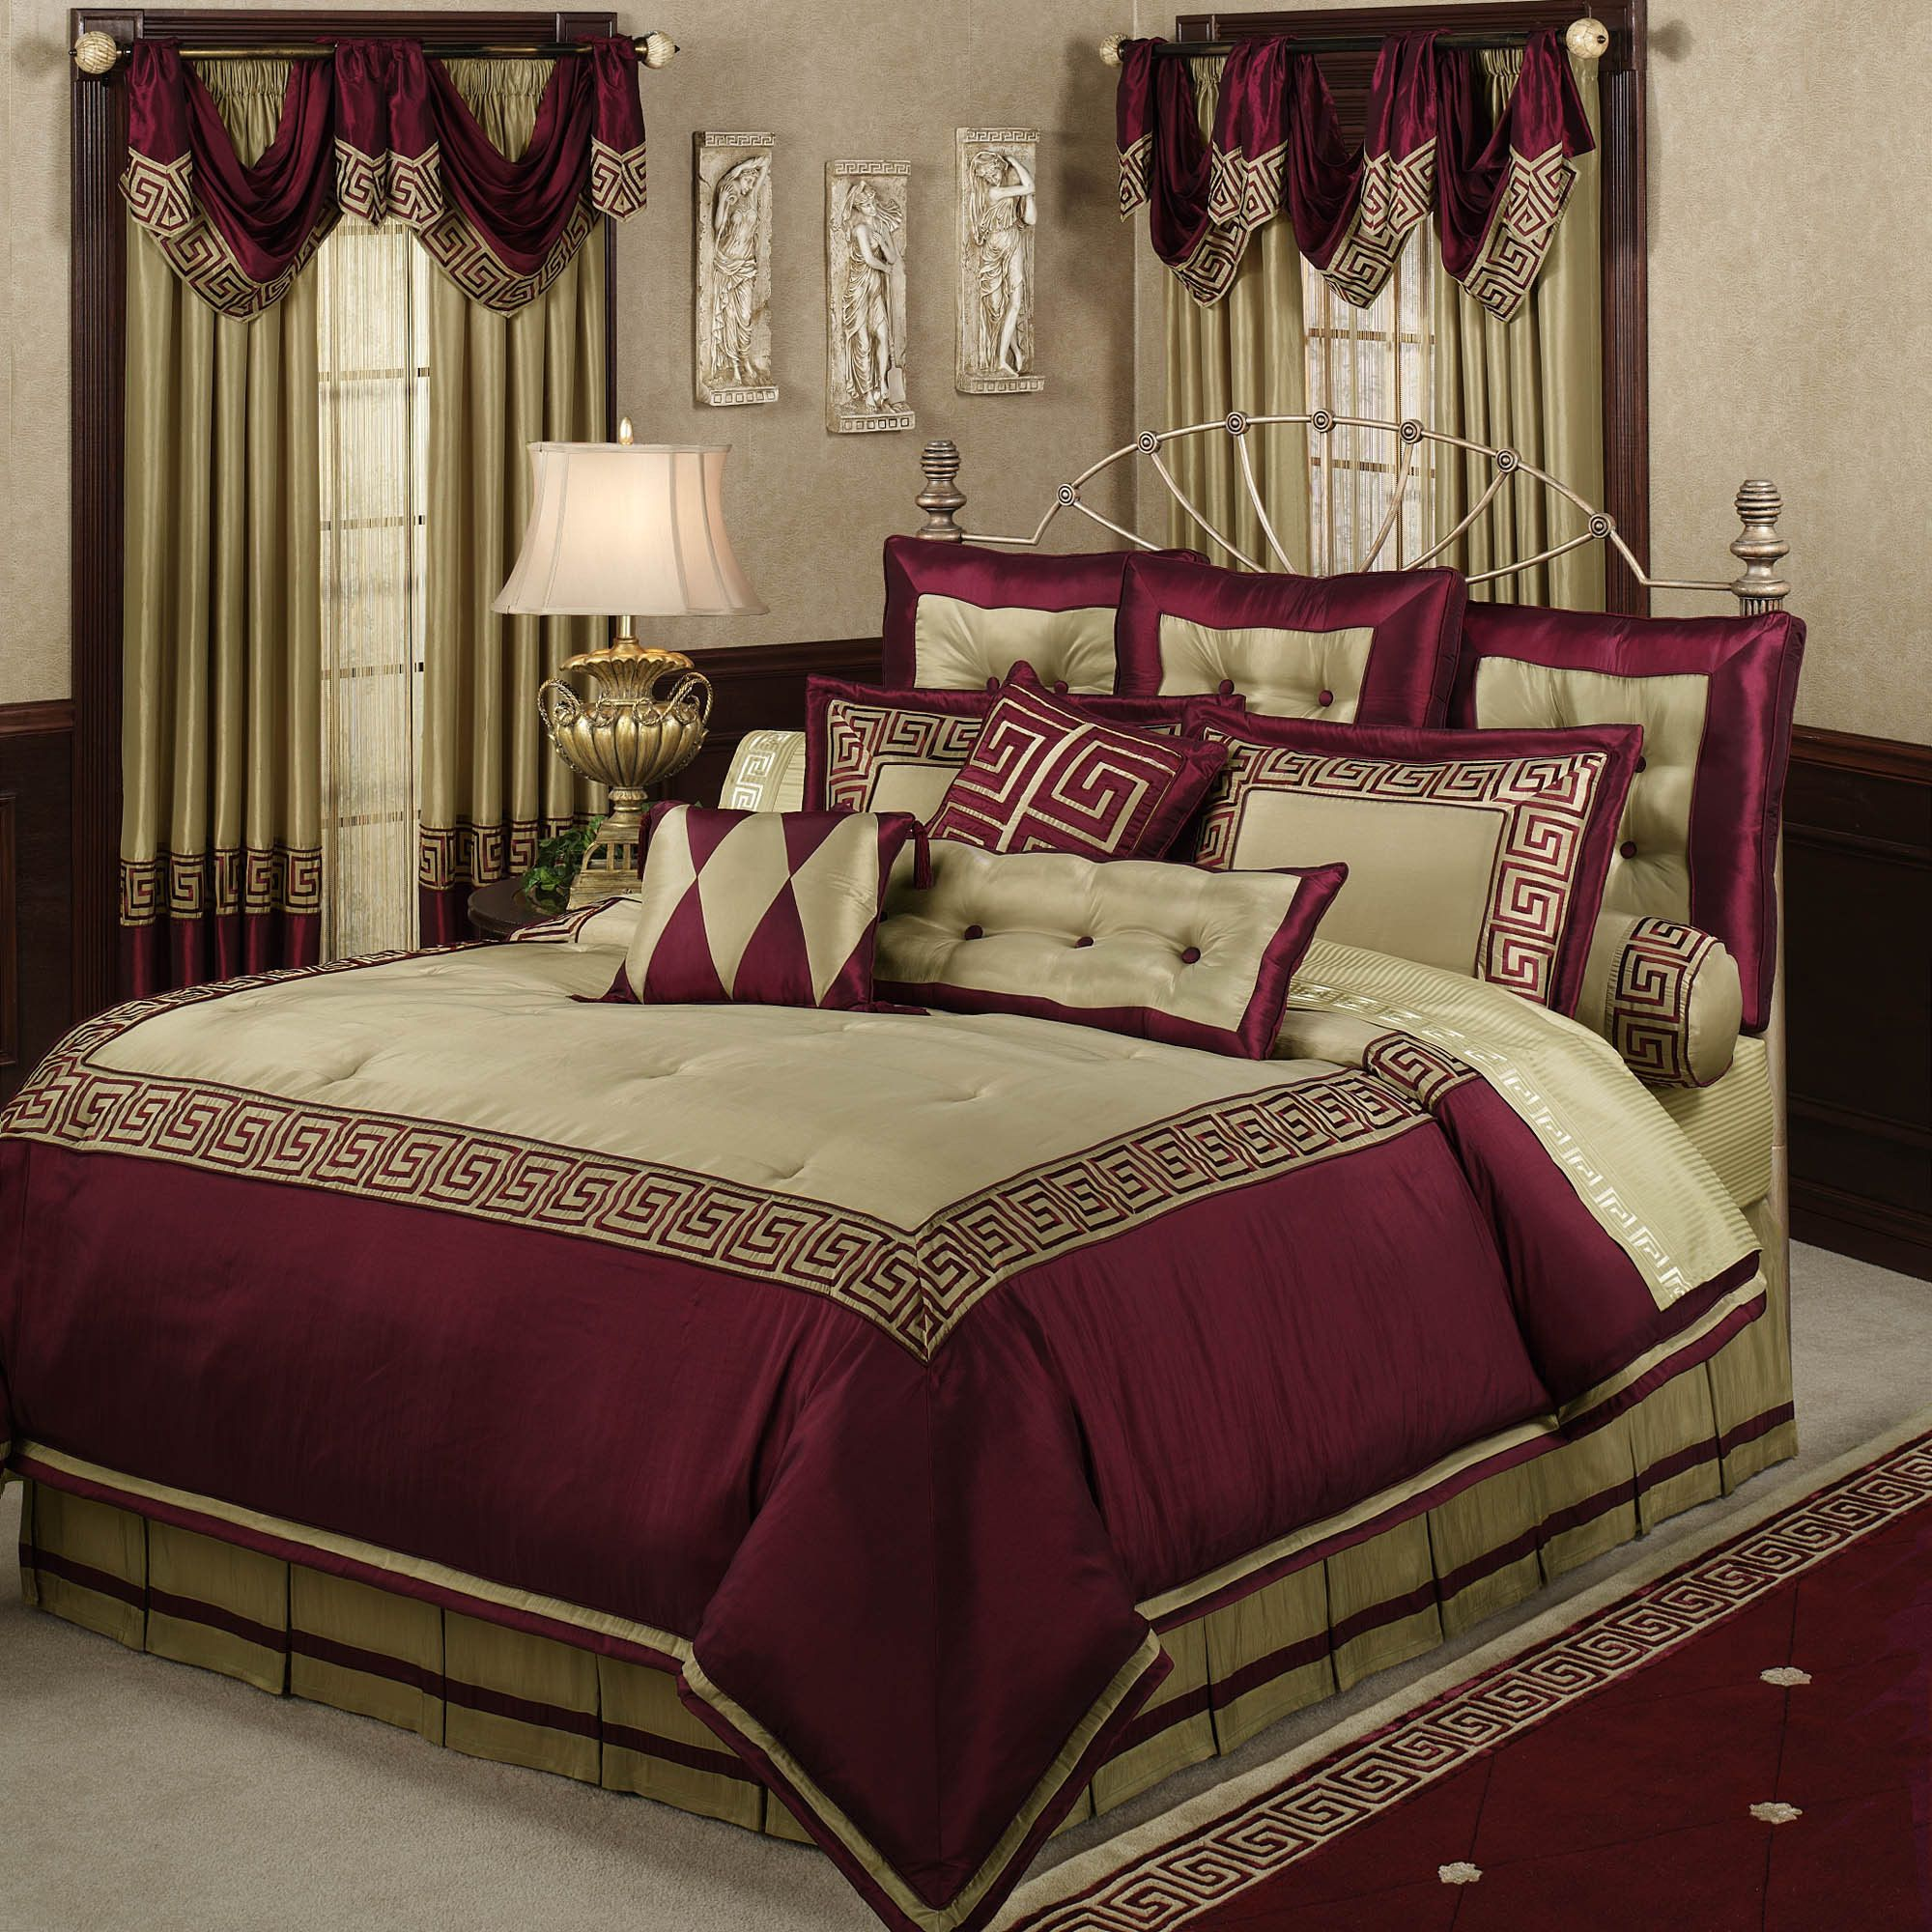 Home Apollo Comforter Set Wine Almond Bedroom Decor Ideas